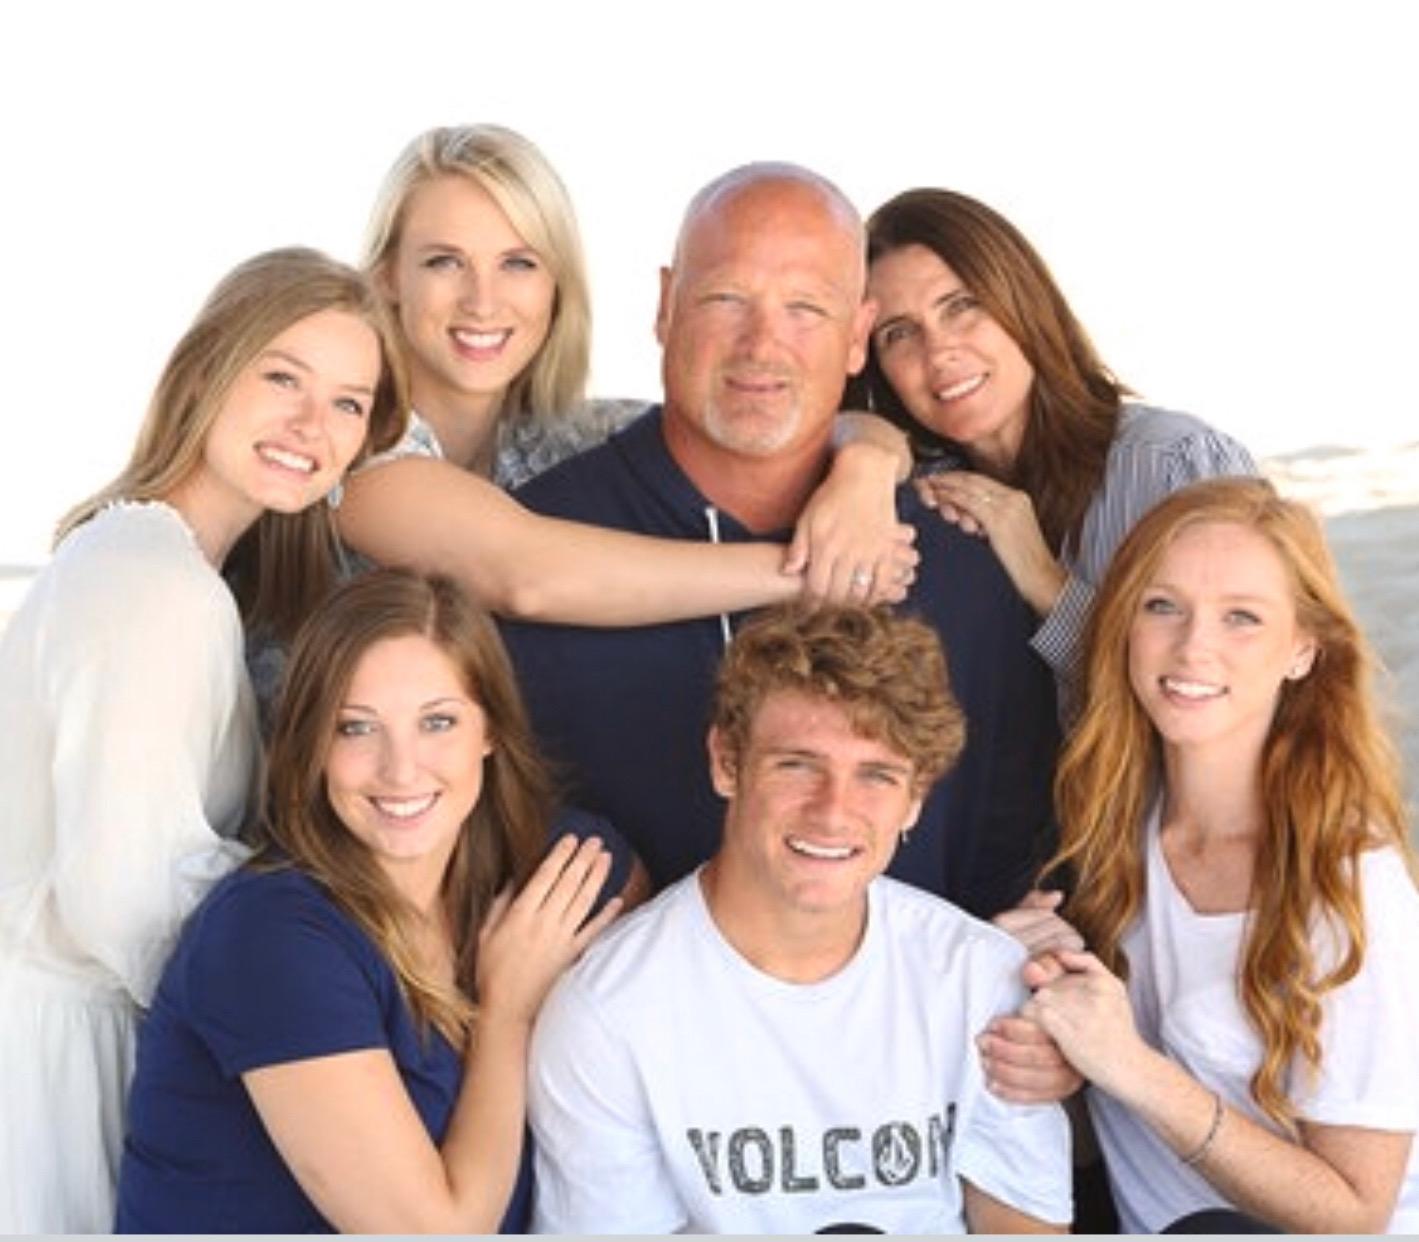 Billy Joe Hobert Image of Family